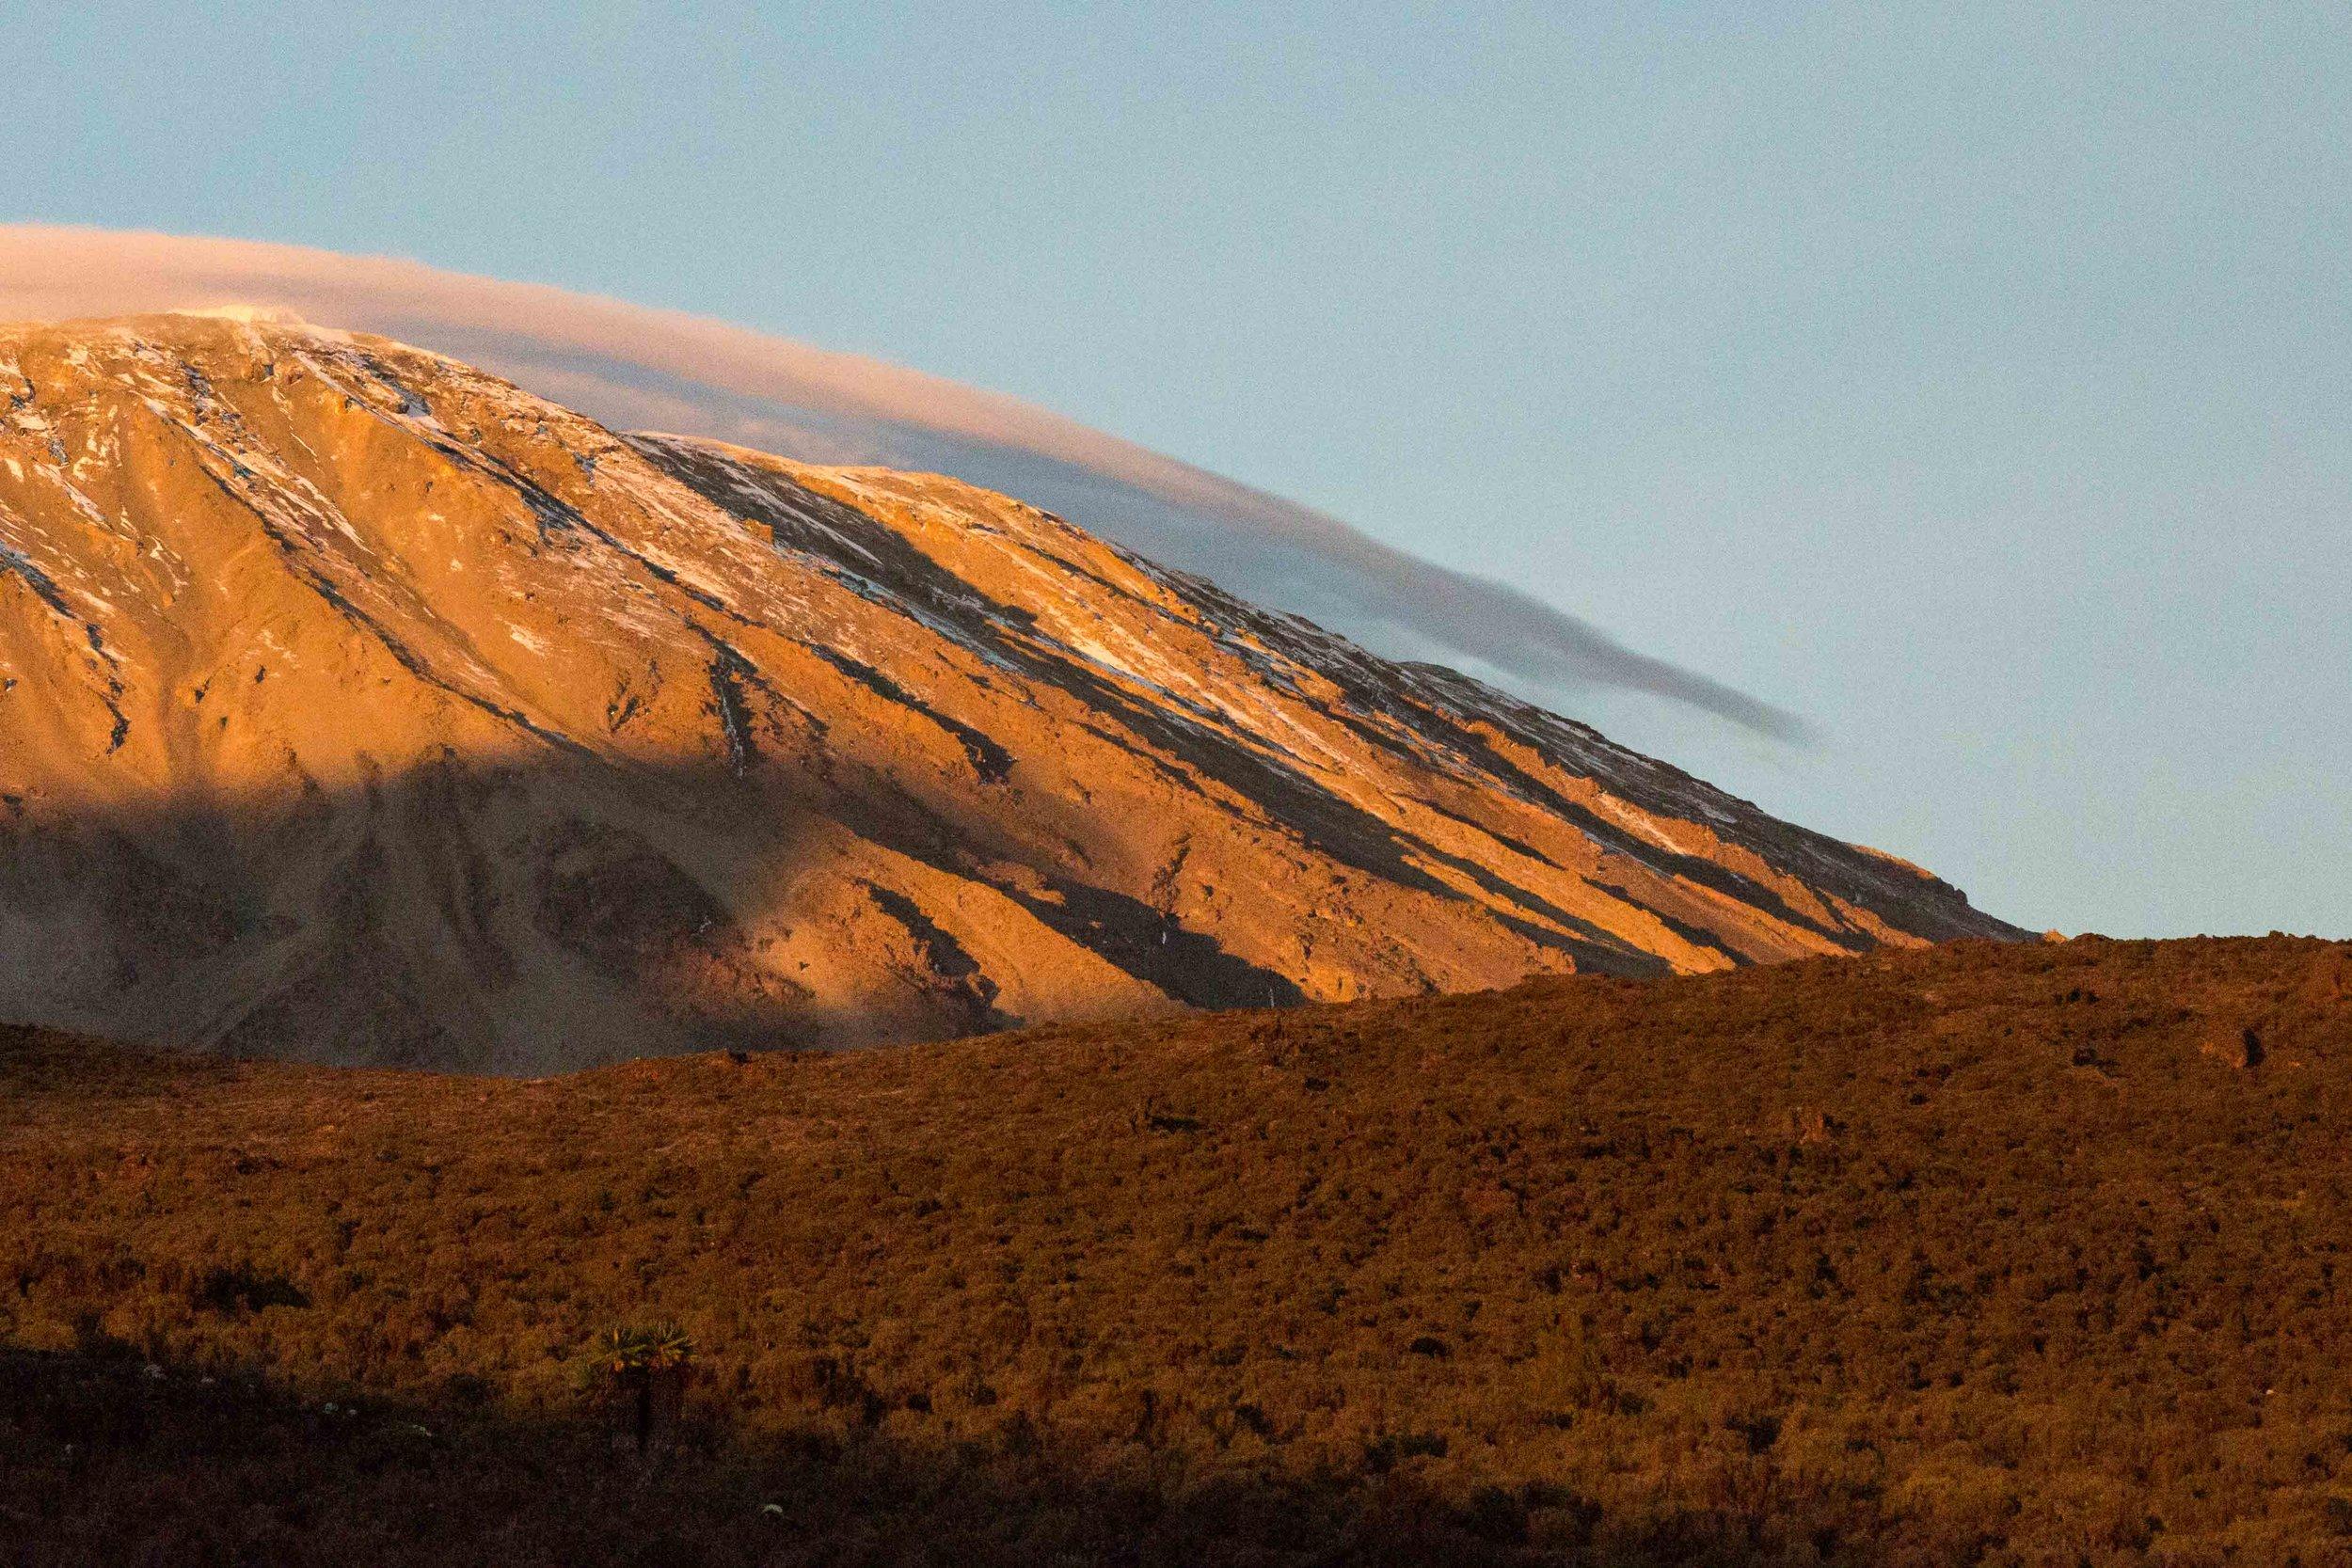 ajw_REI_Kilimanjaro-21.jpg